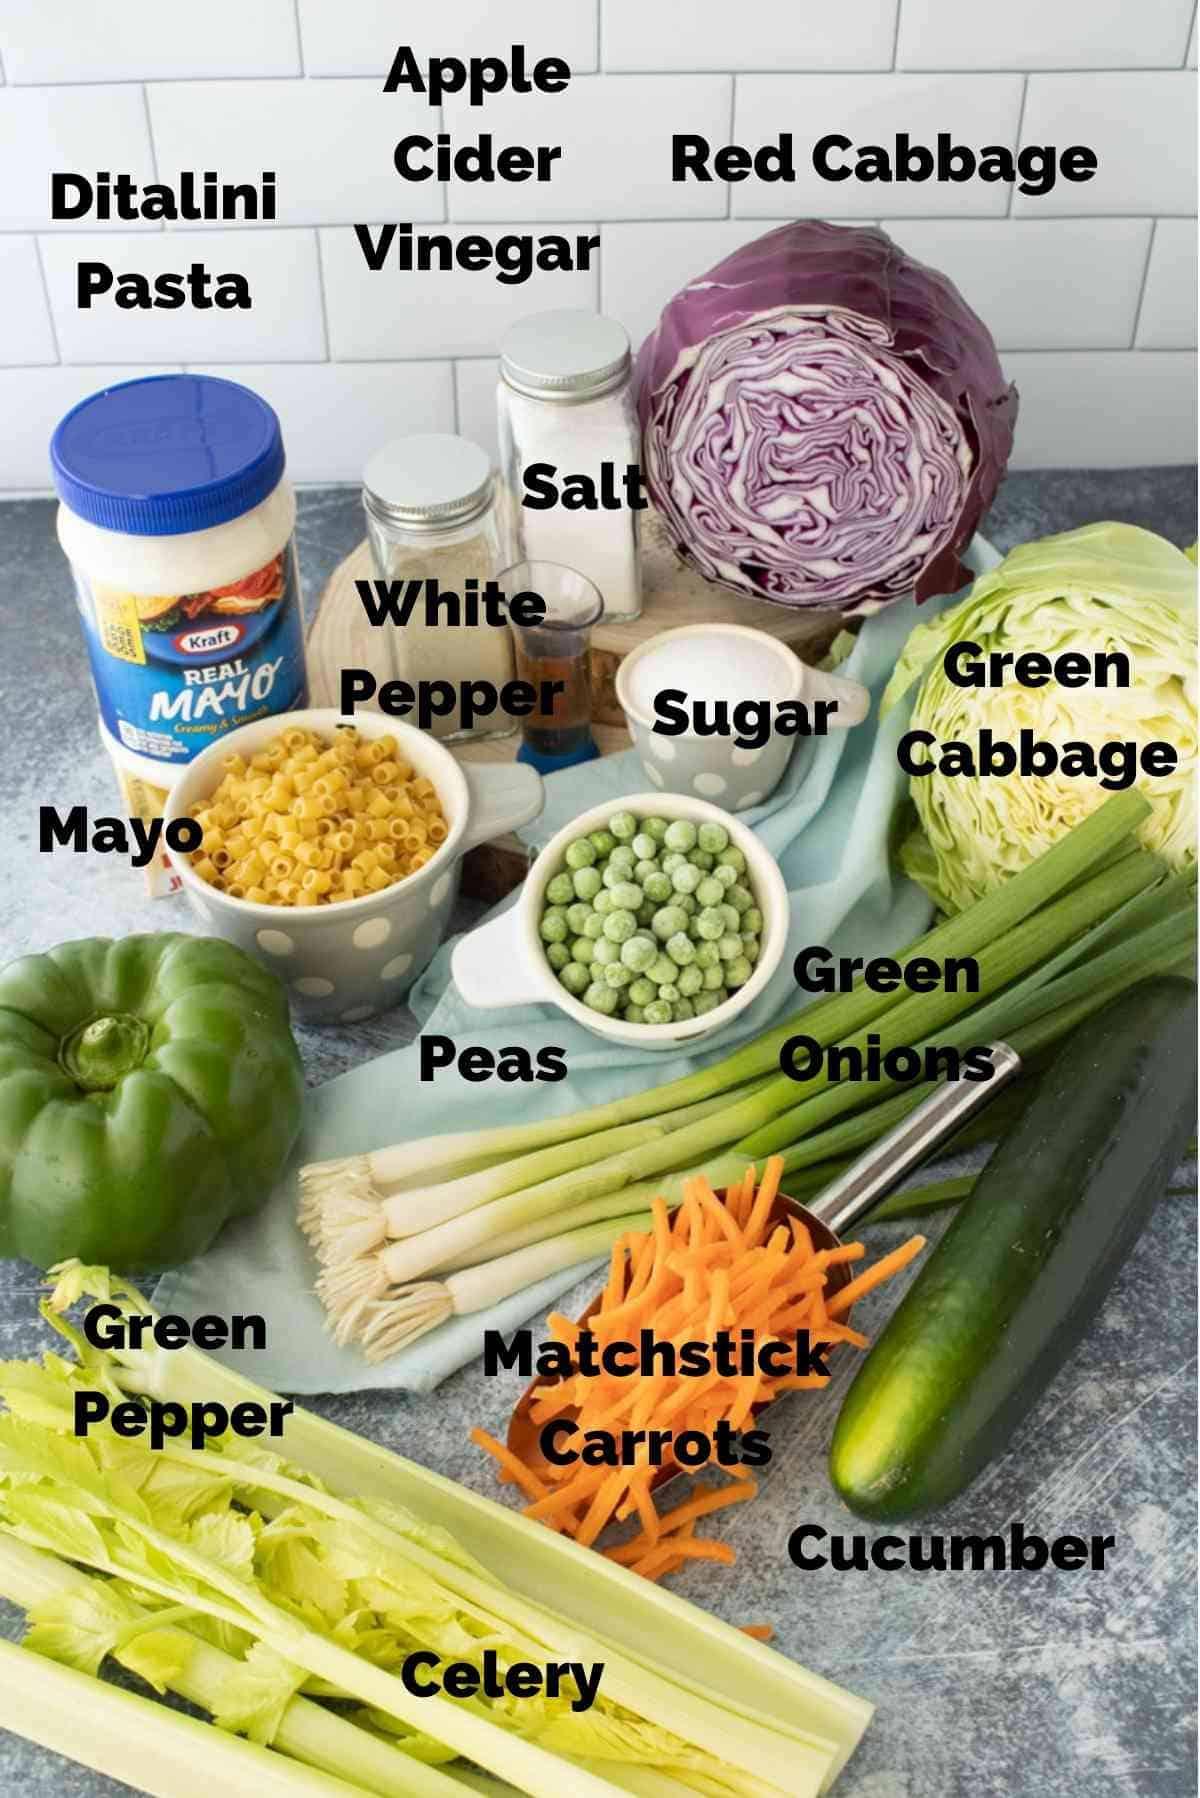 Ingredients for macaroni coleslaw.